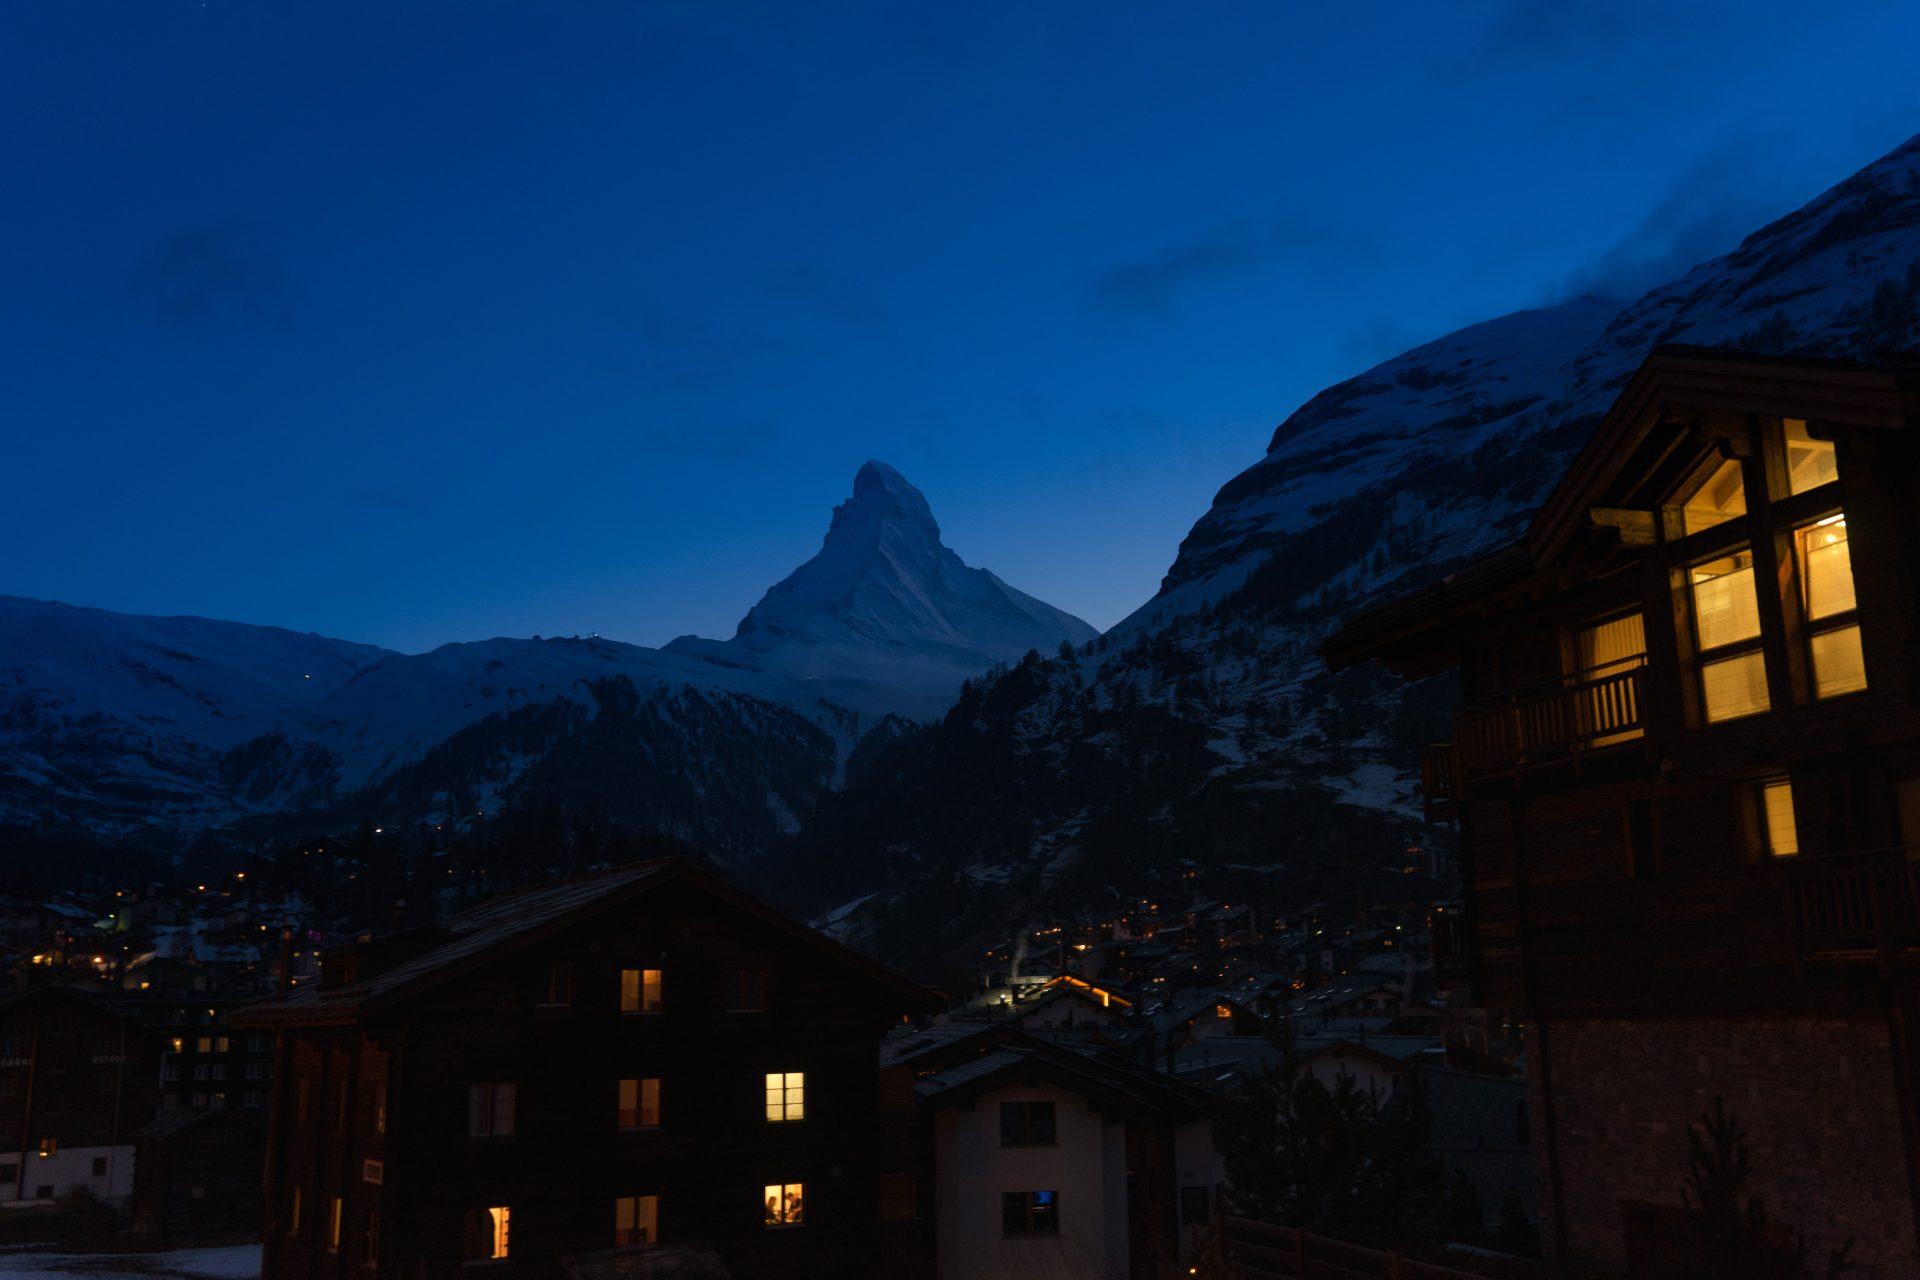 Matterhorn at Night – Switzerland